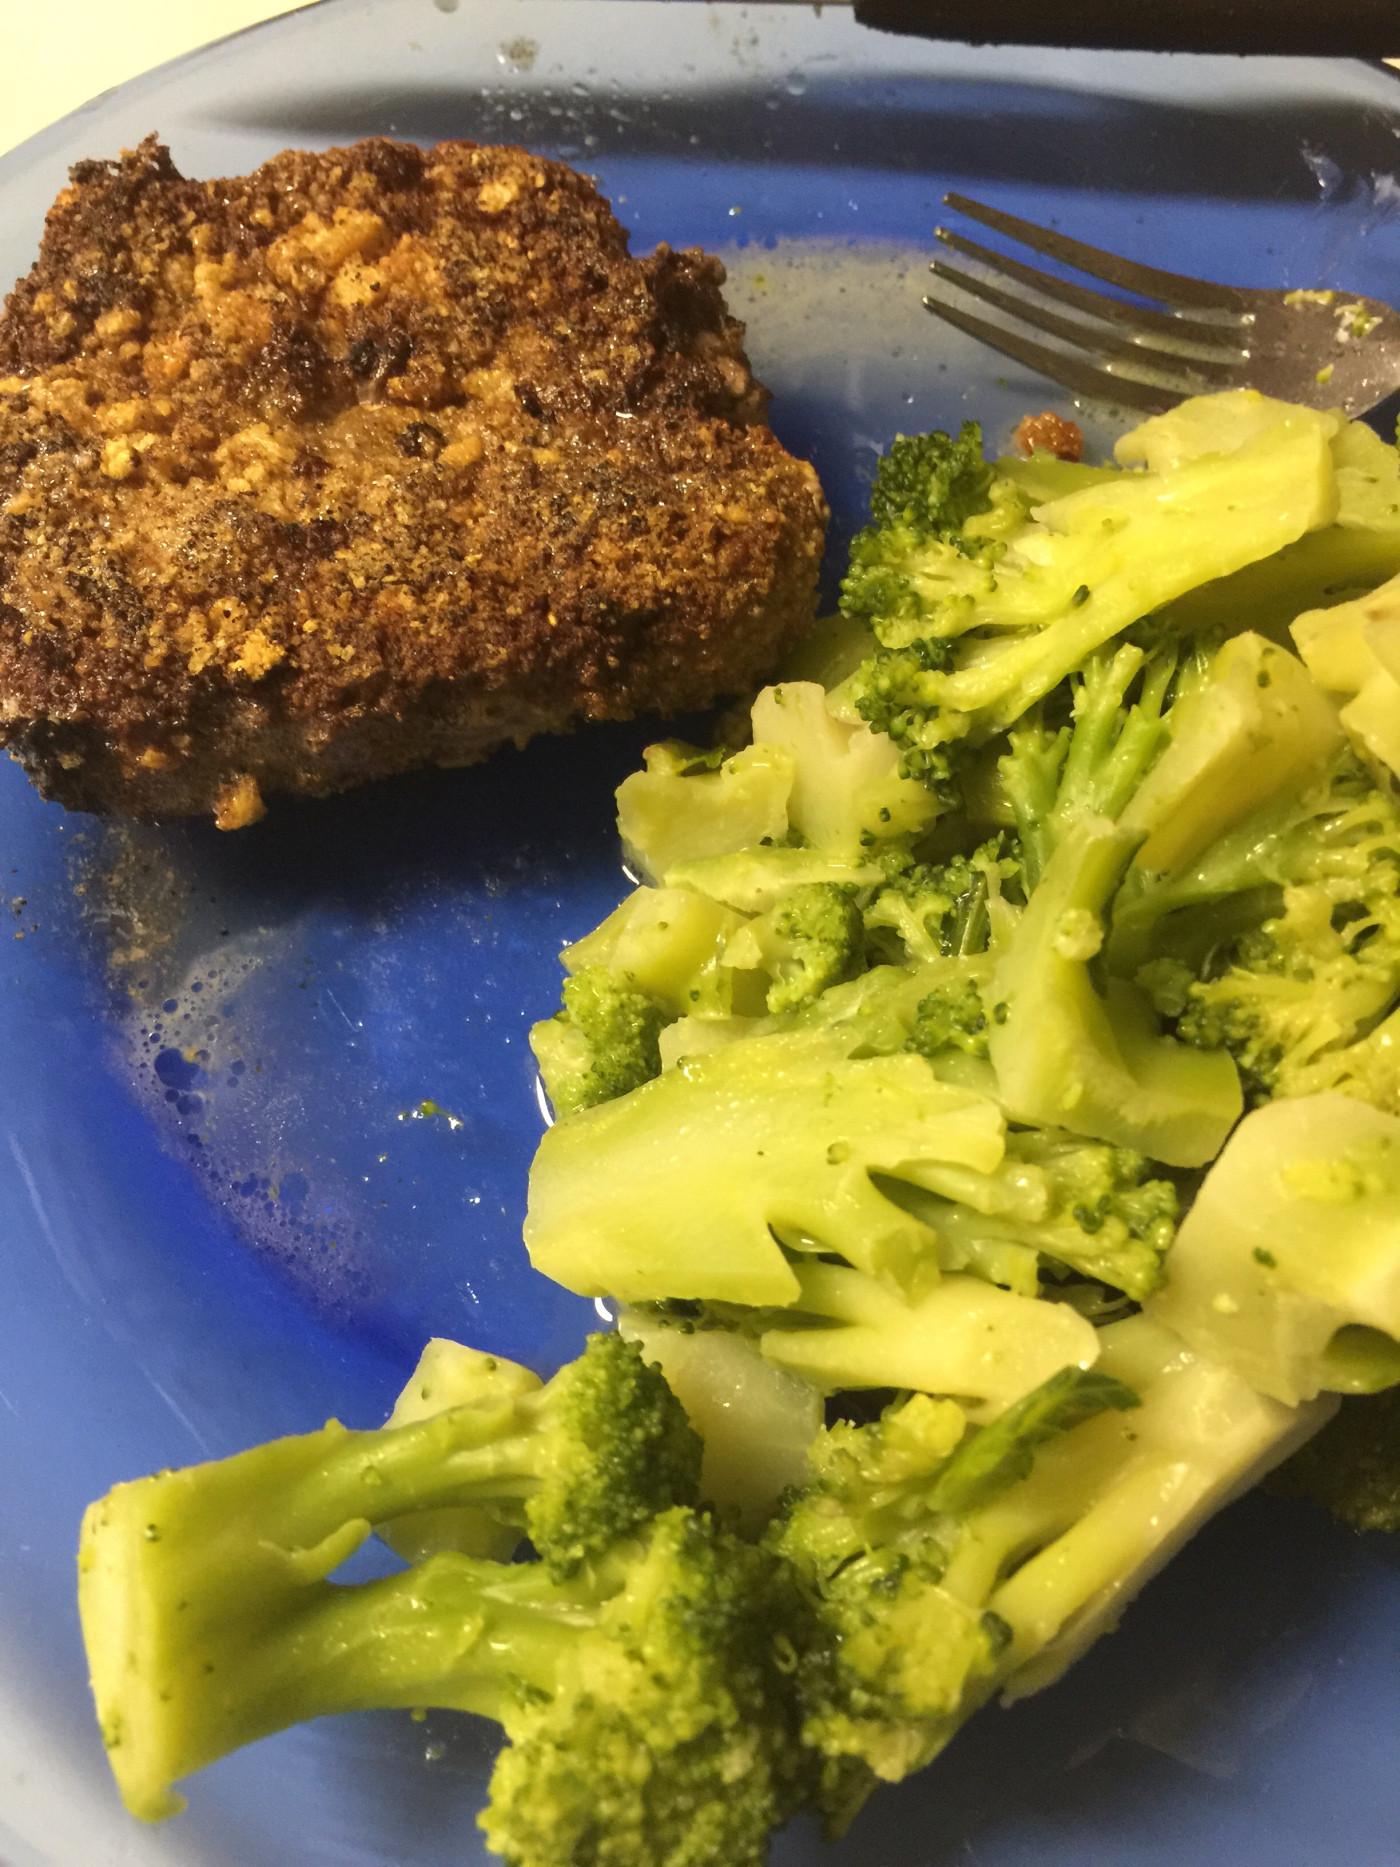 Keto Chicken Fried Steak  Recipe Time – Keto Chicken Fried Steak – My Big Fat Keto Life